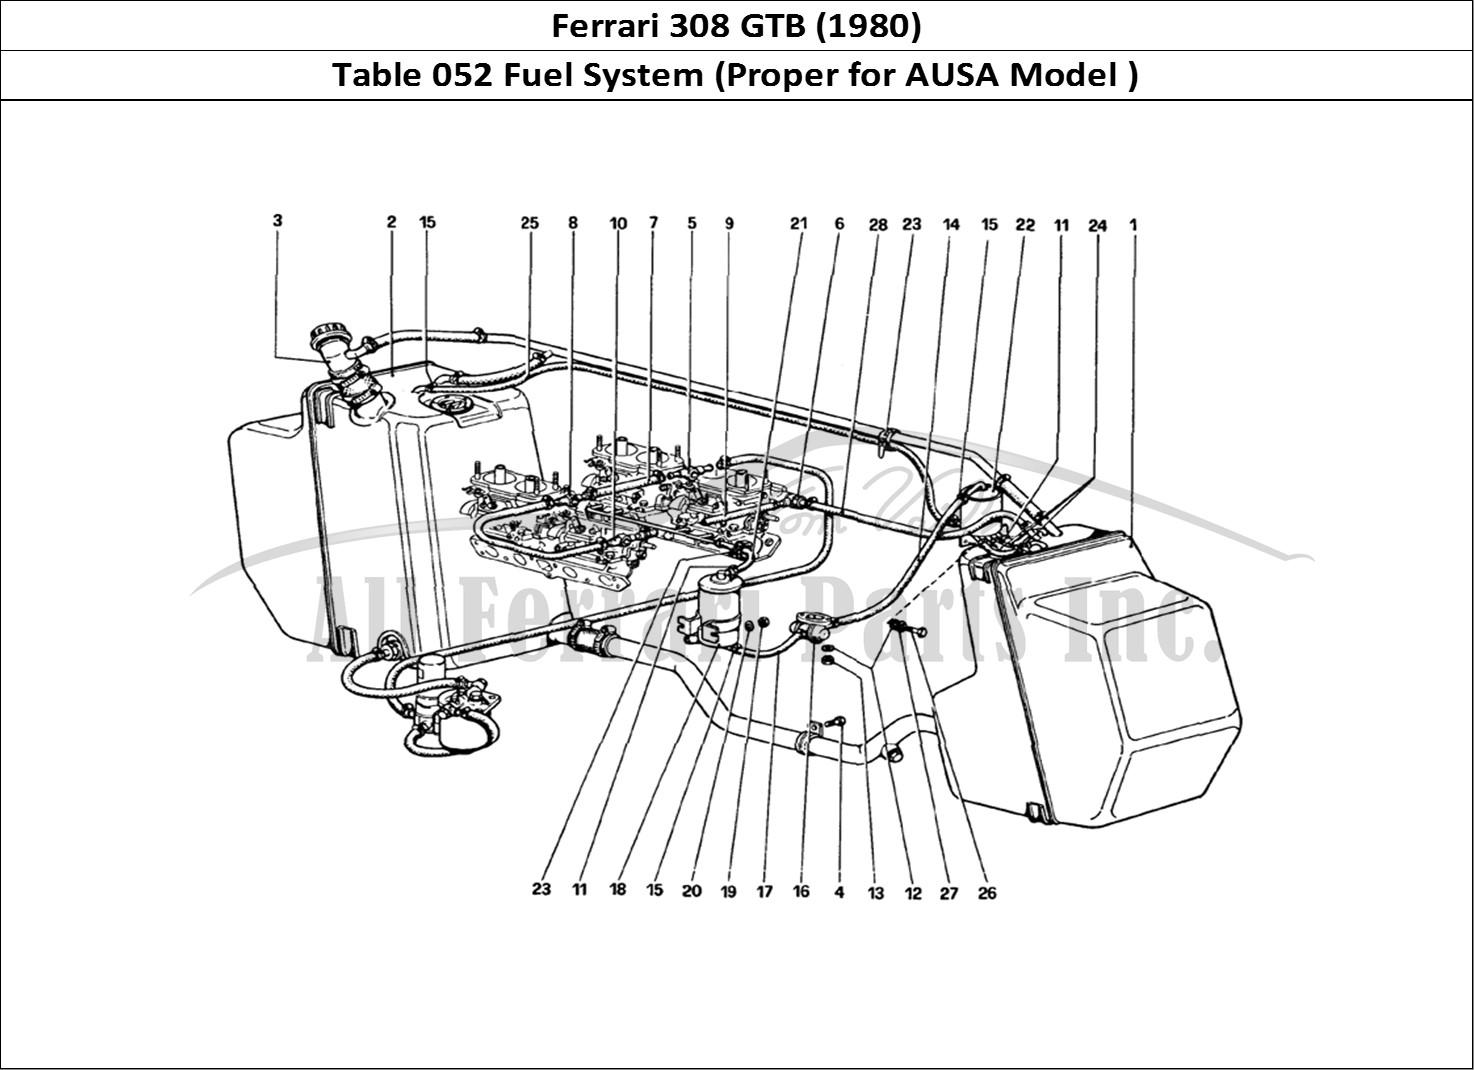 Buy Original Ferrari 308 Gtb 052 Fuel System